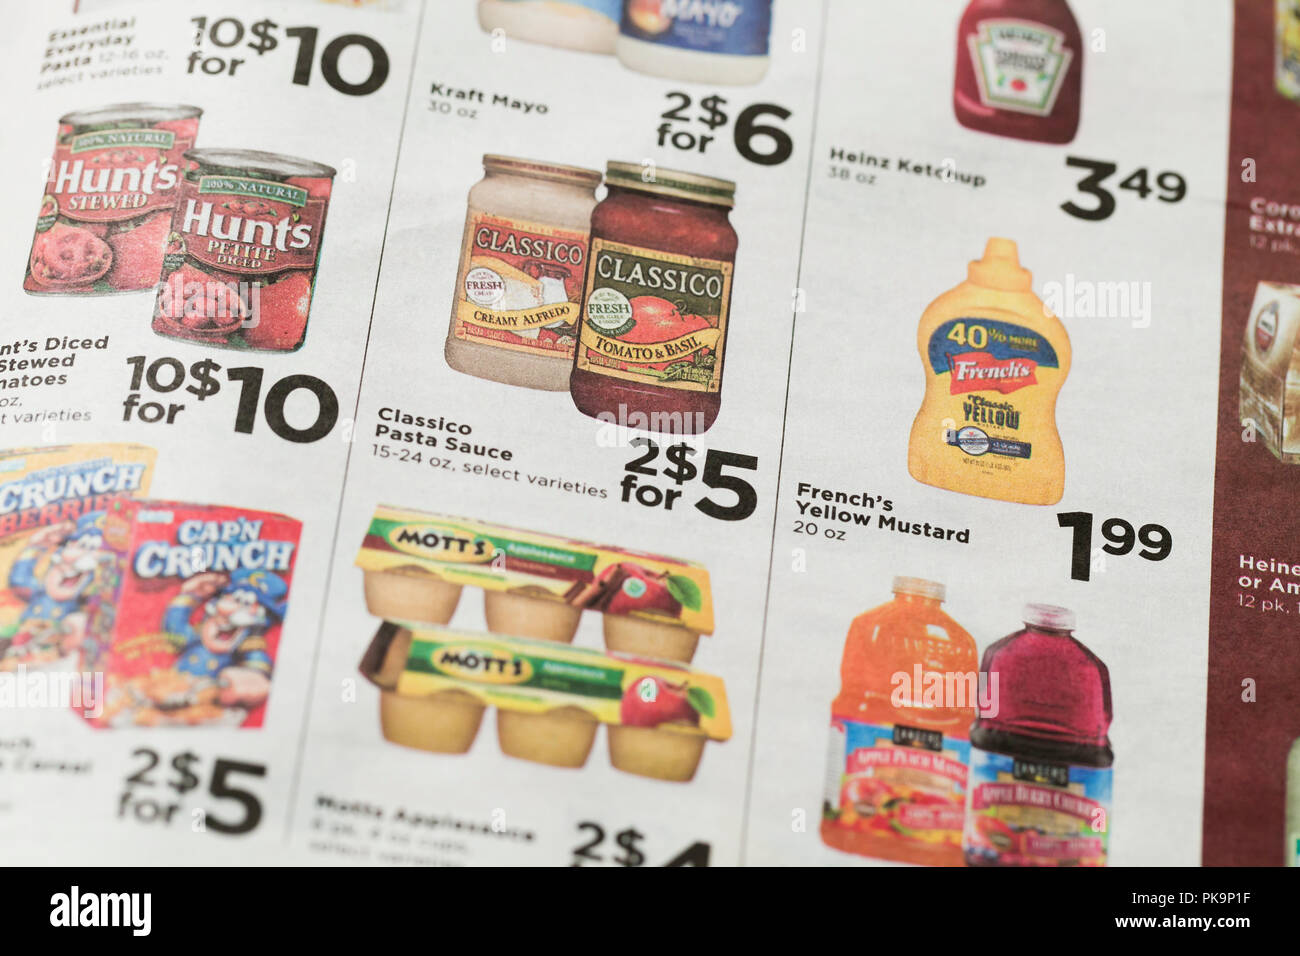 Supermercado Ad